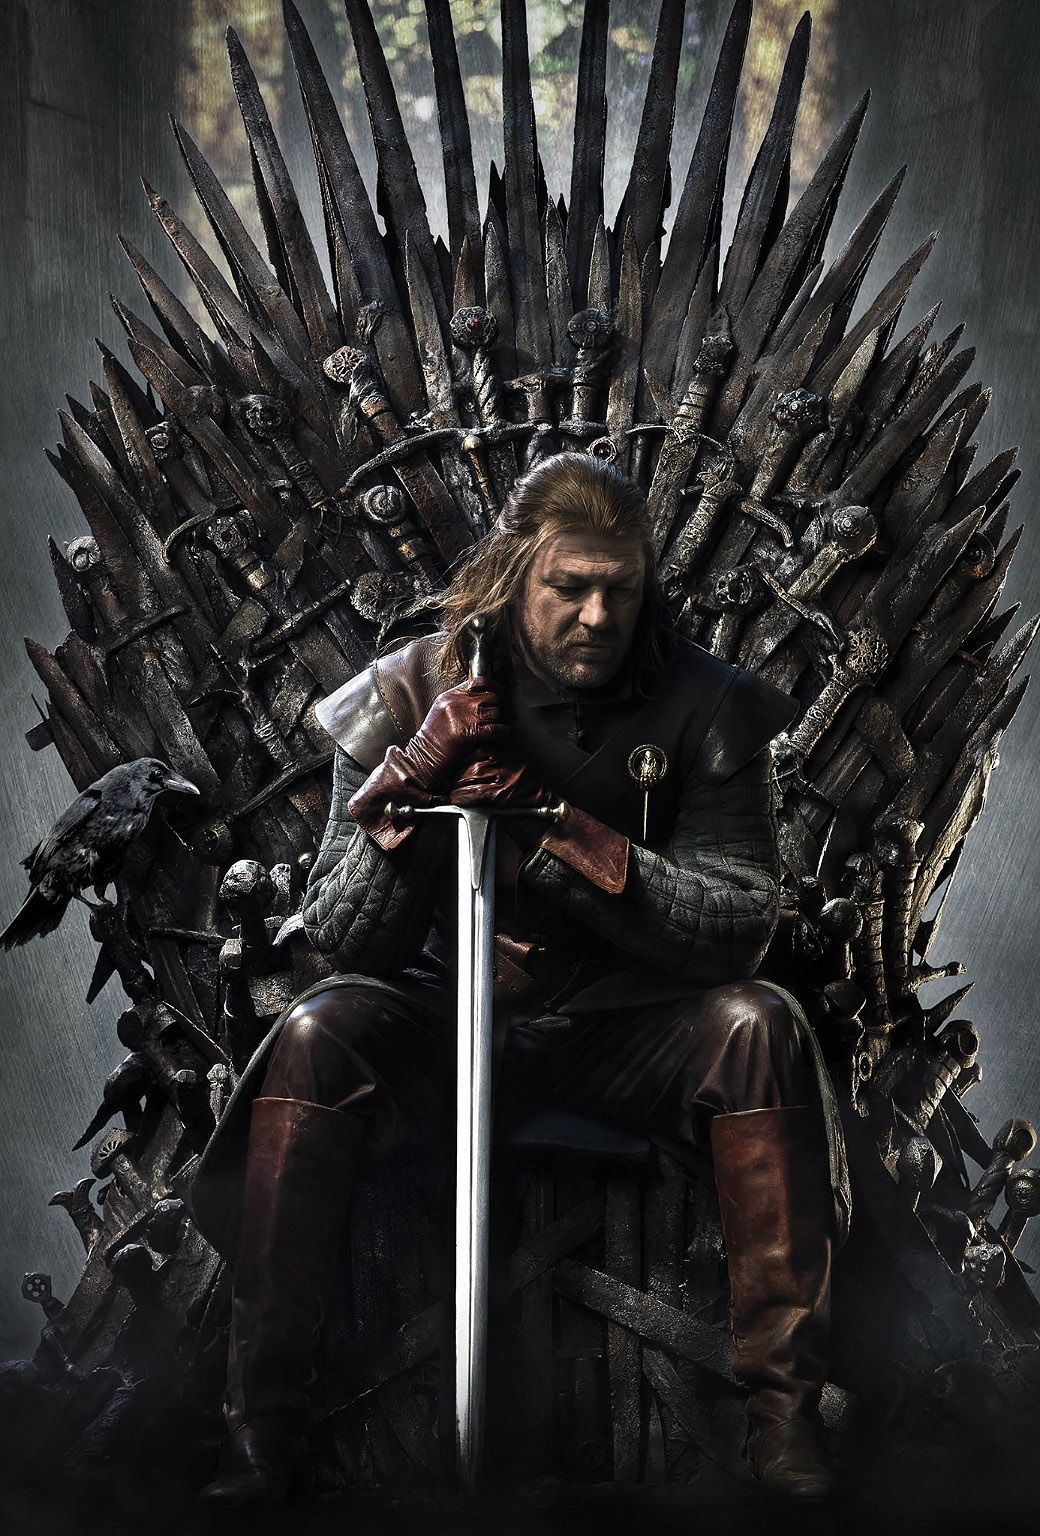 fond d'ecran anime game of thrones